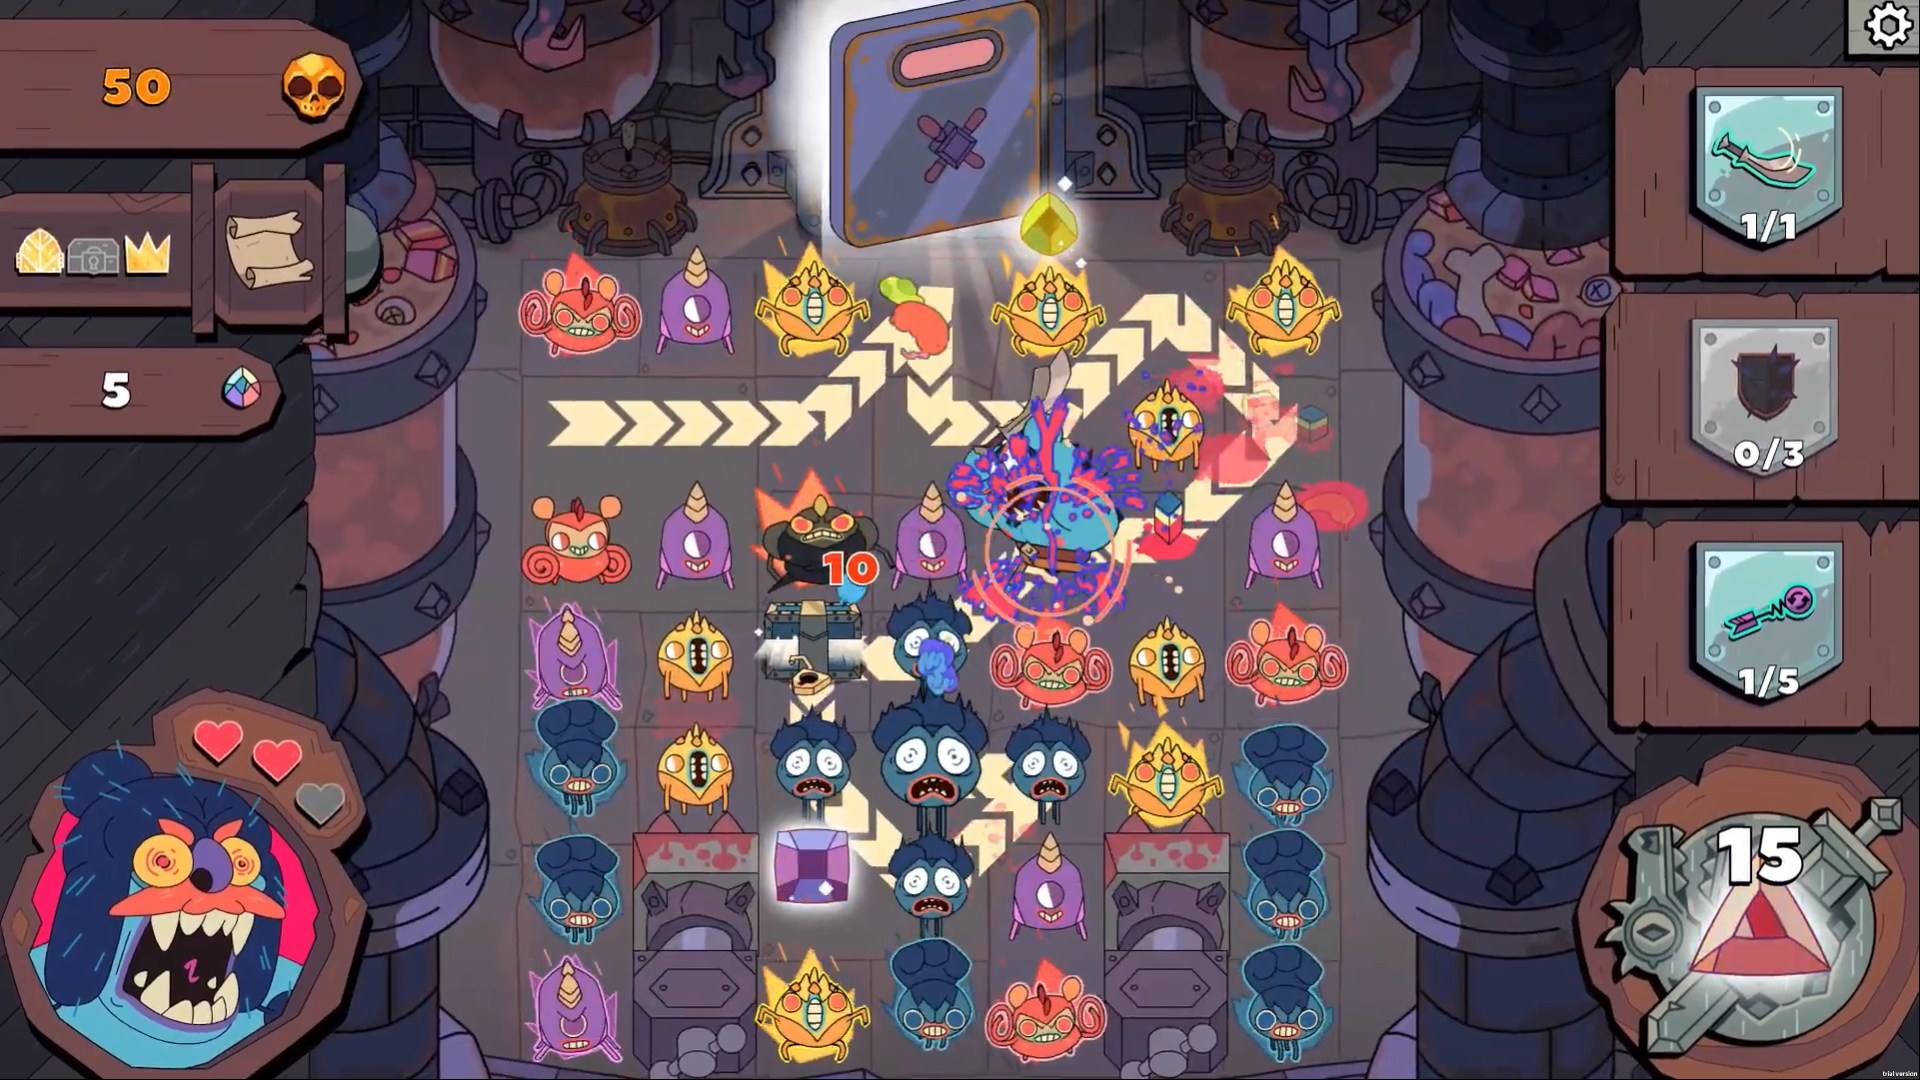 grindstone game screenshot wallpaper 72614